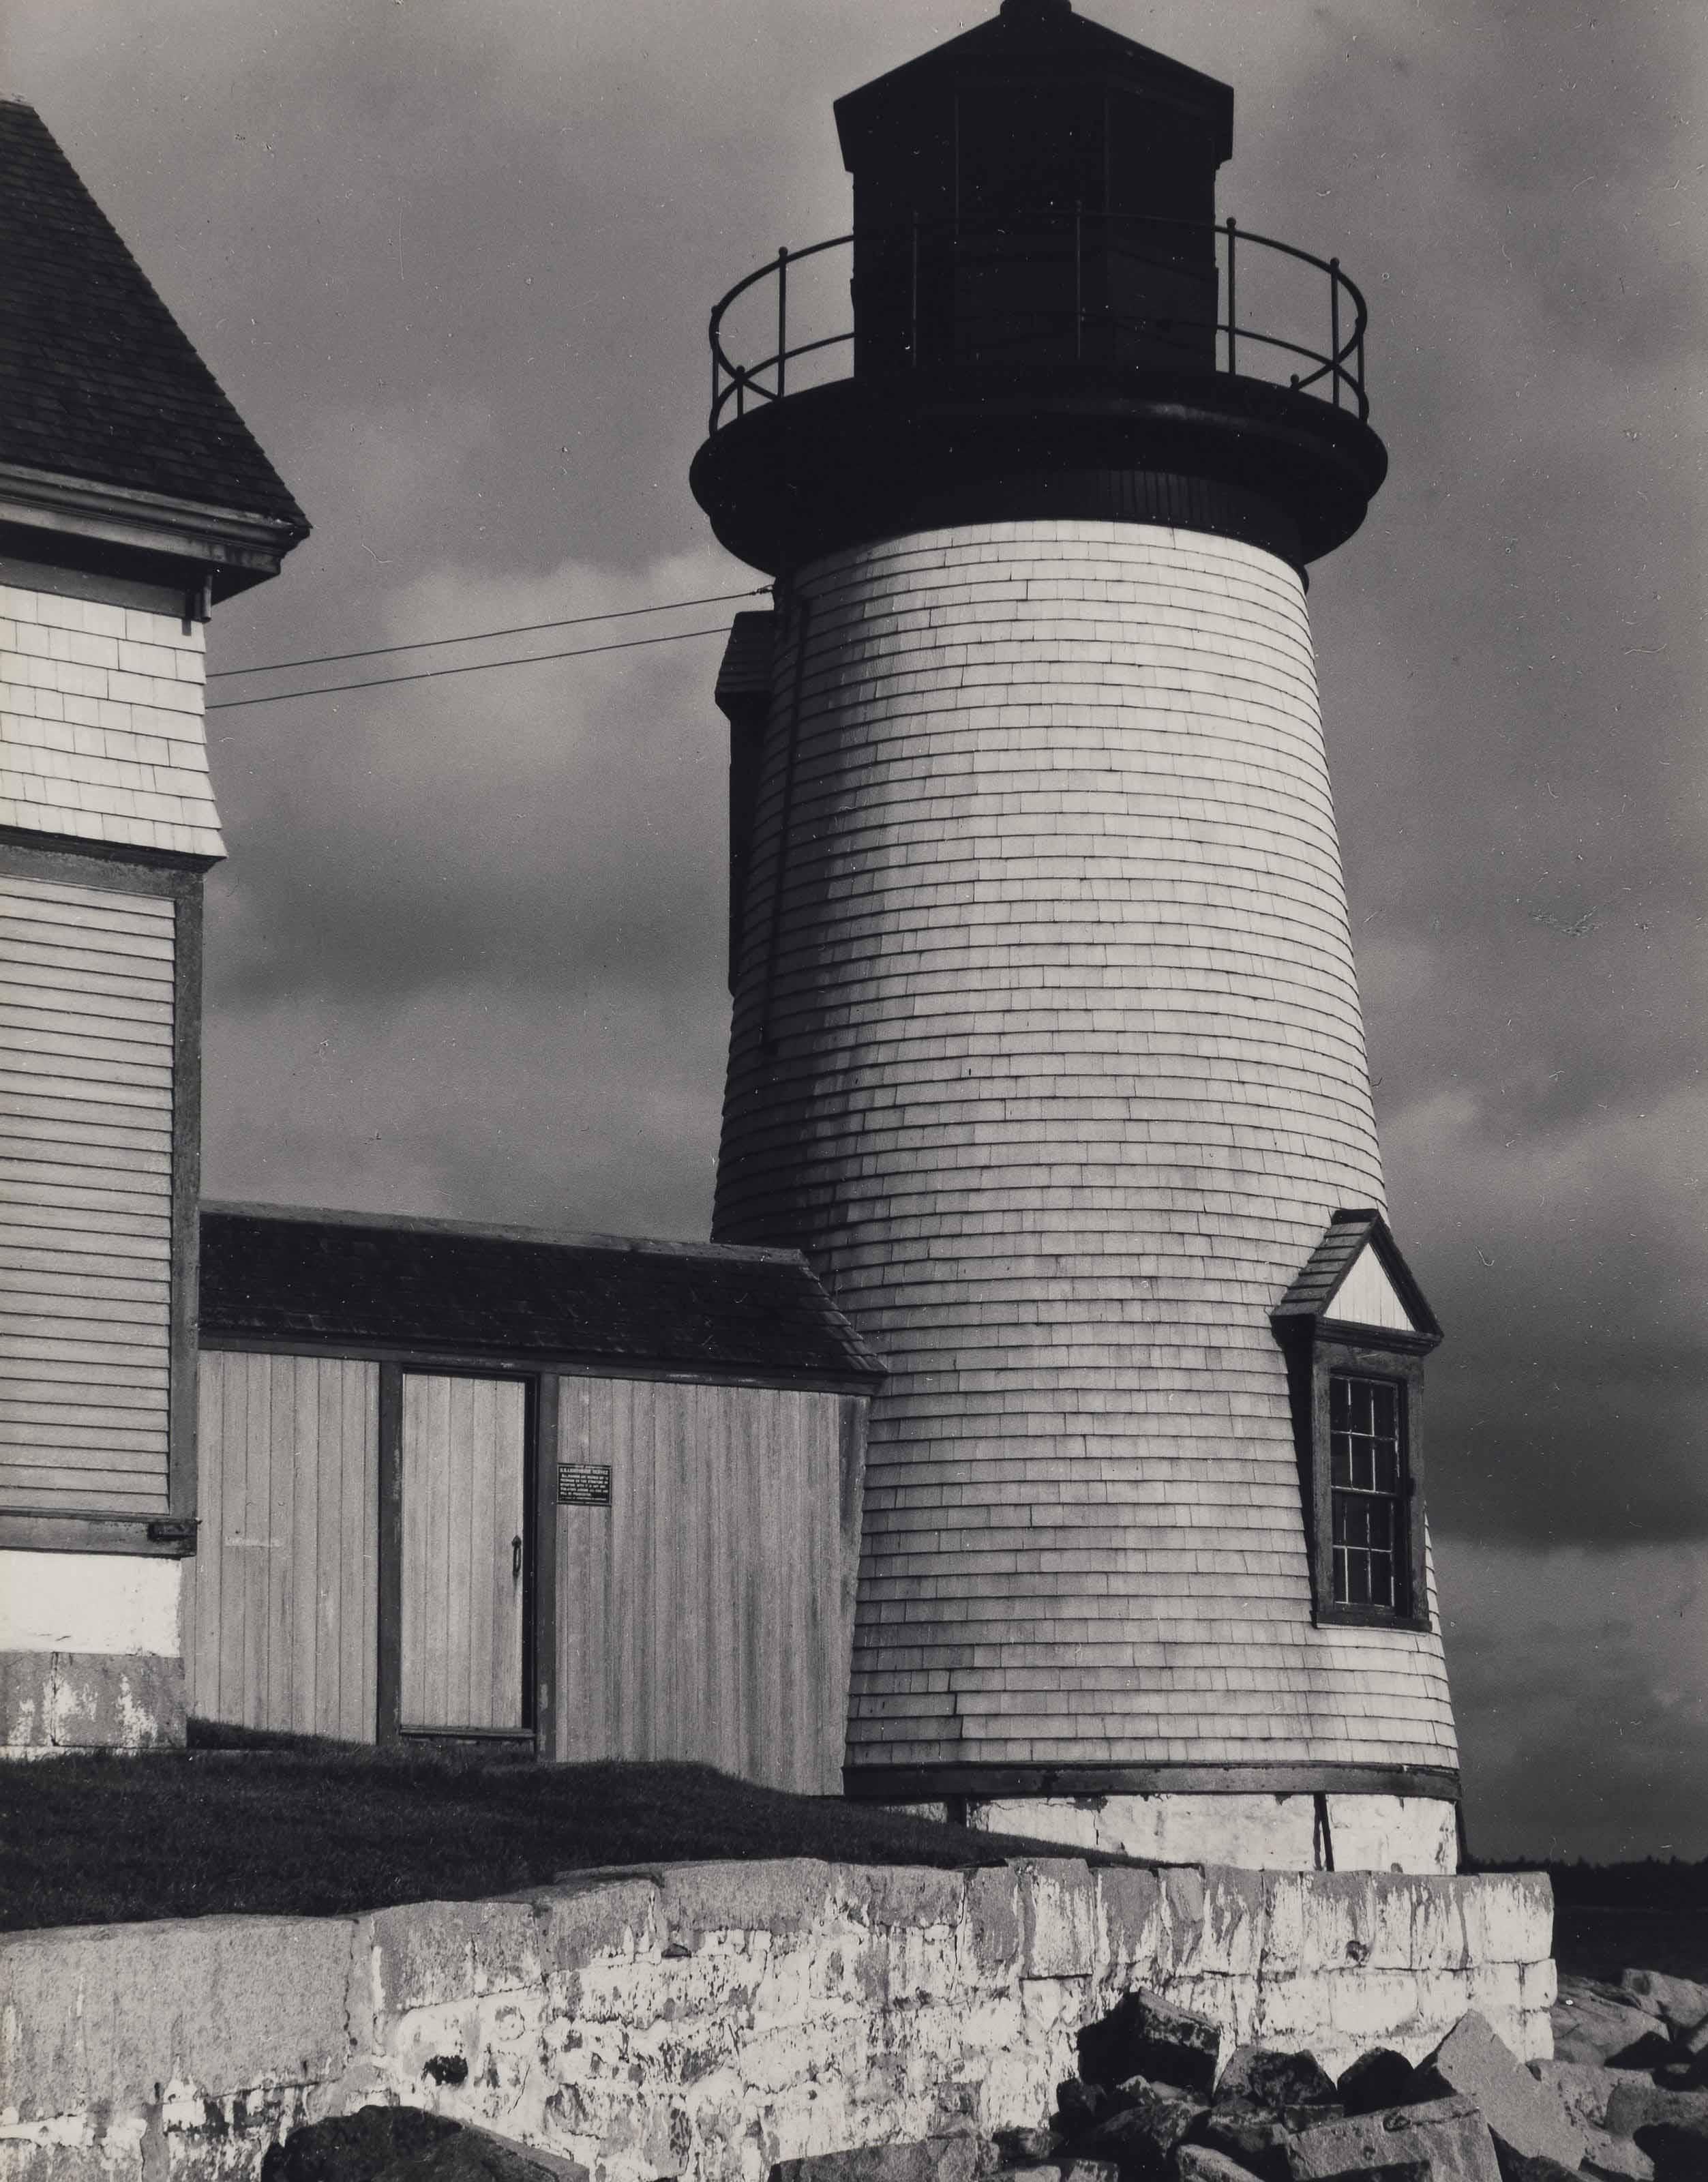 The Lighthouse, Prospect Harbor, Maine, 1945